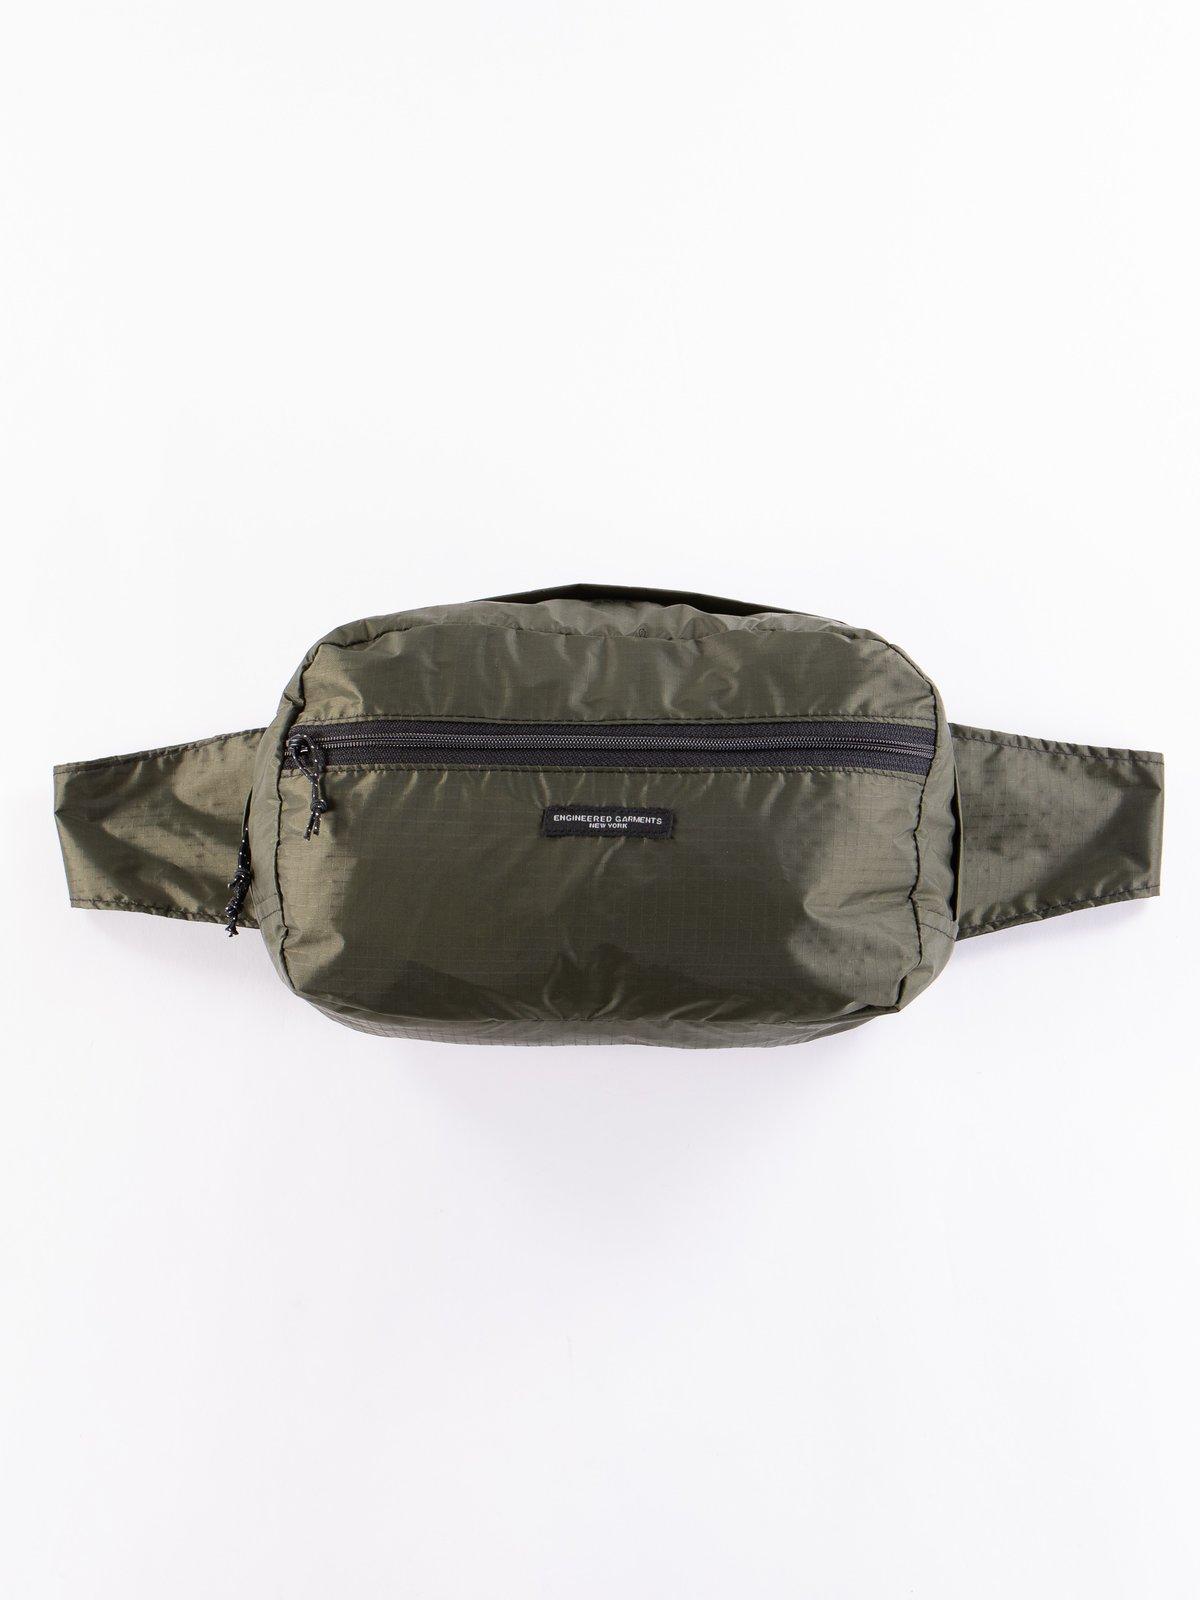 Olive Nylon Ripstop UL Waistpack - Image 1